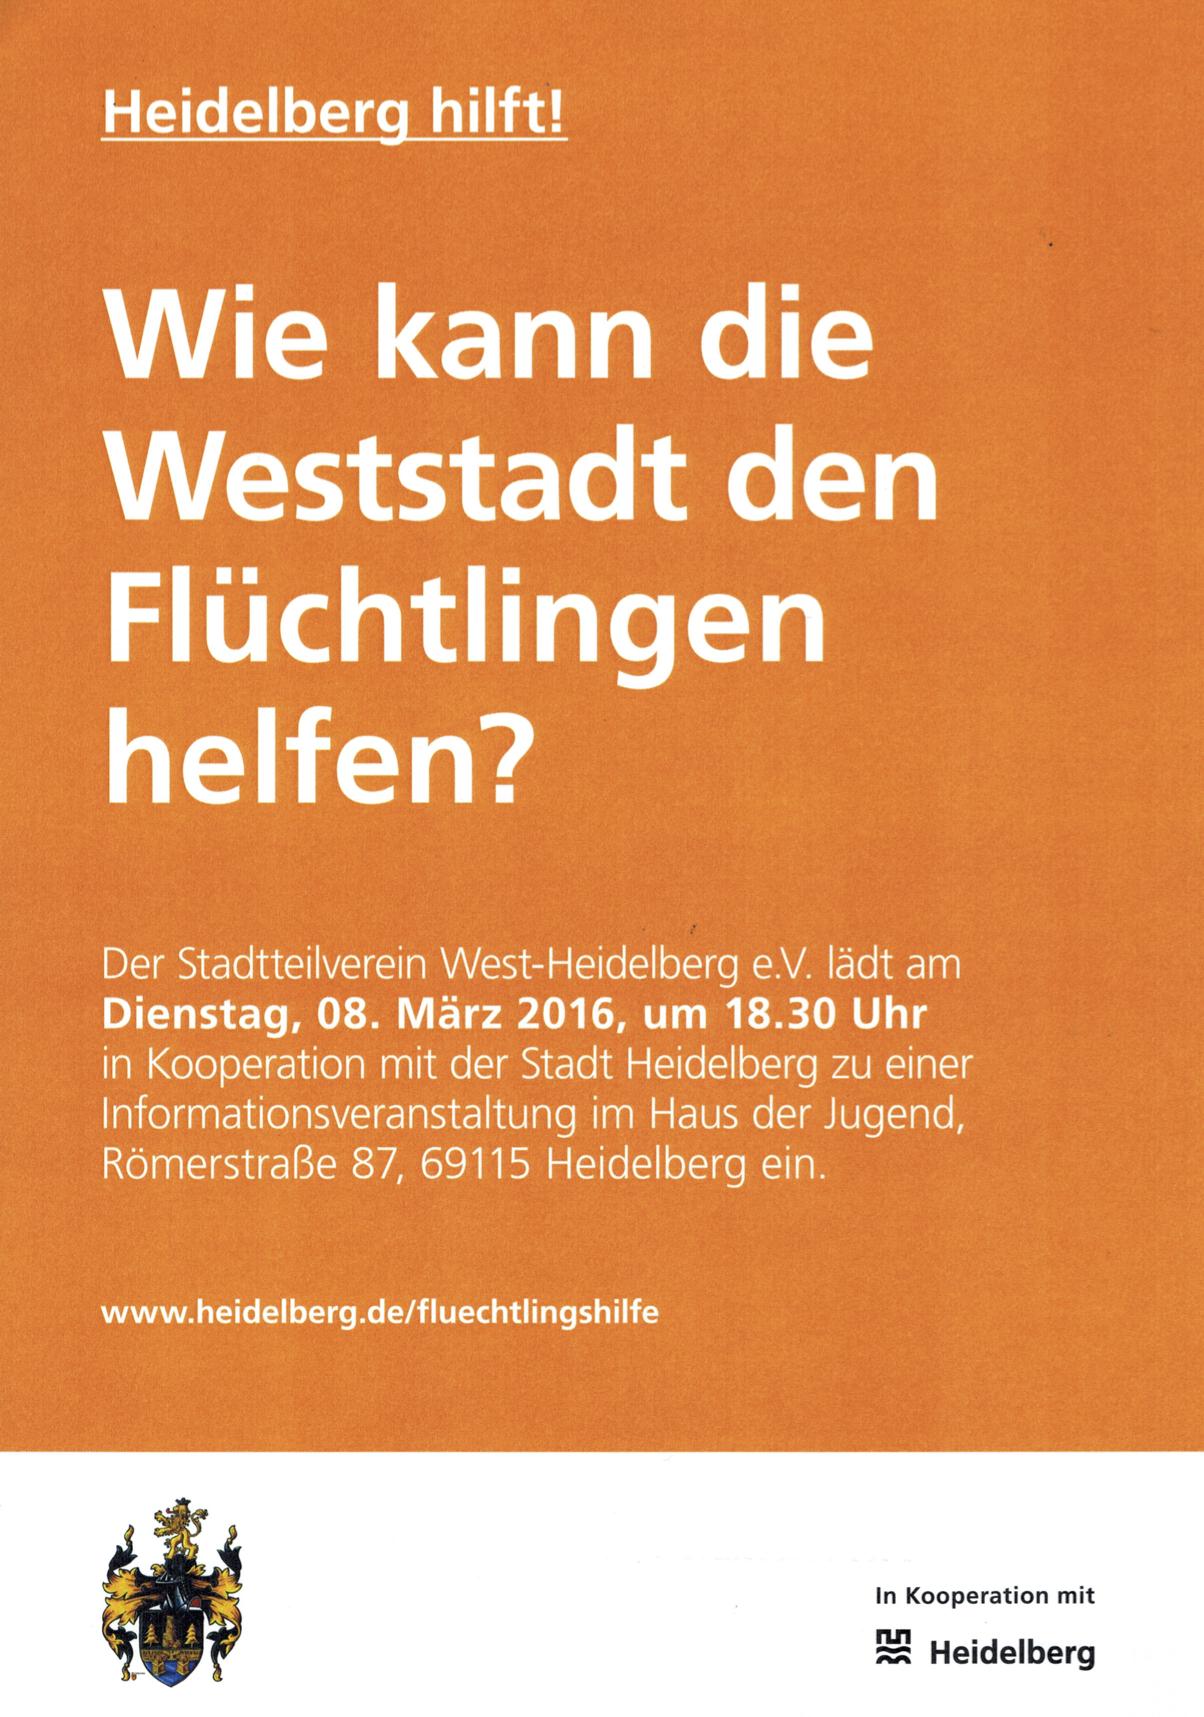 Heidelberg hilft!